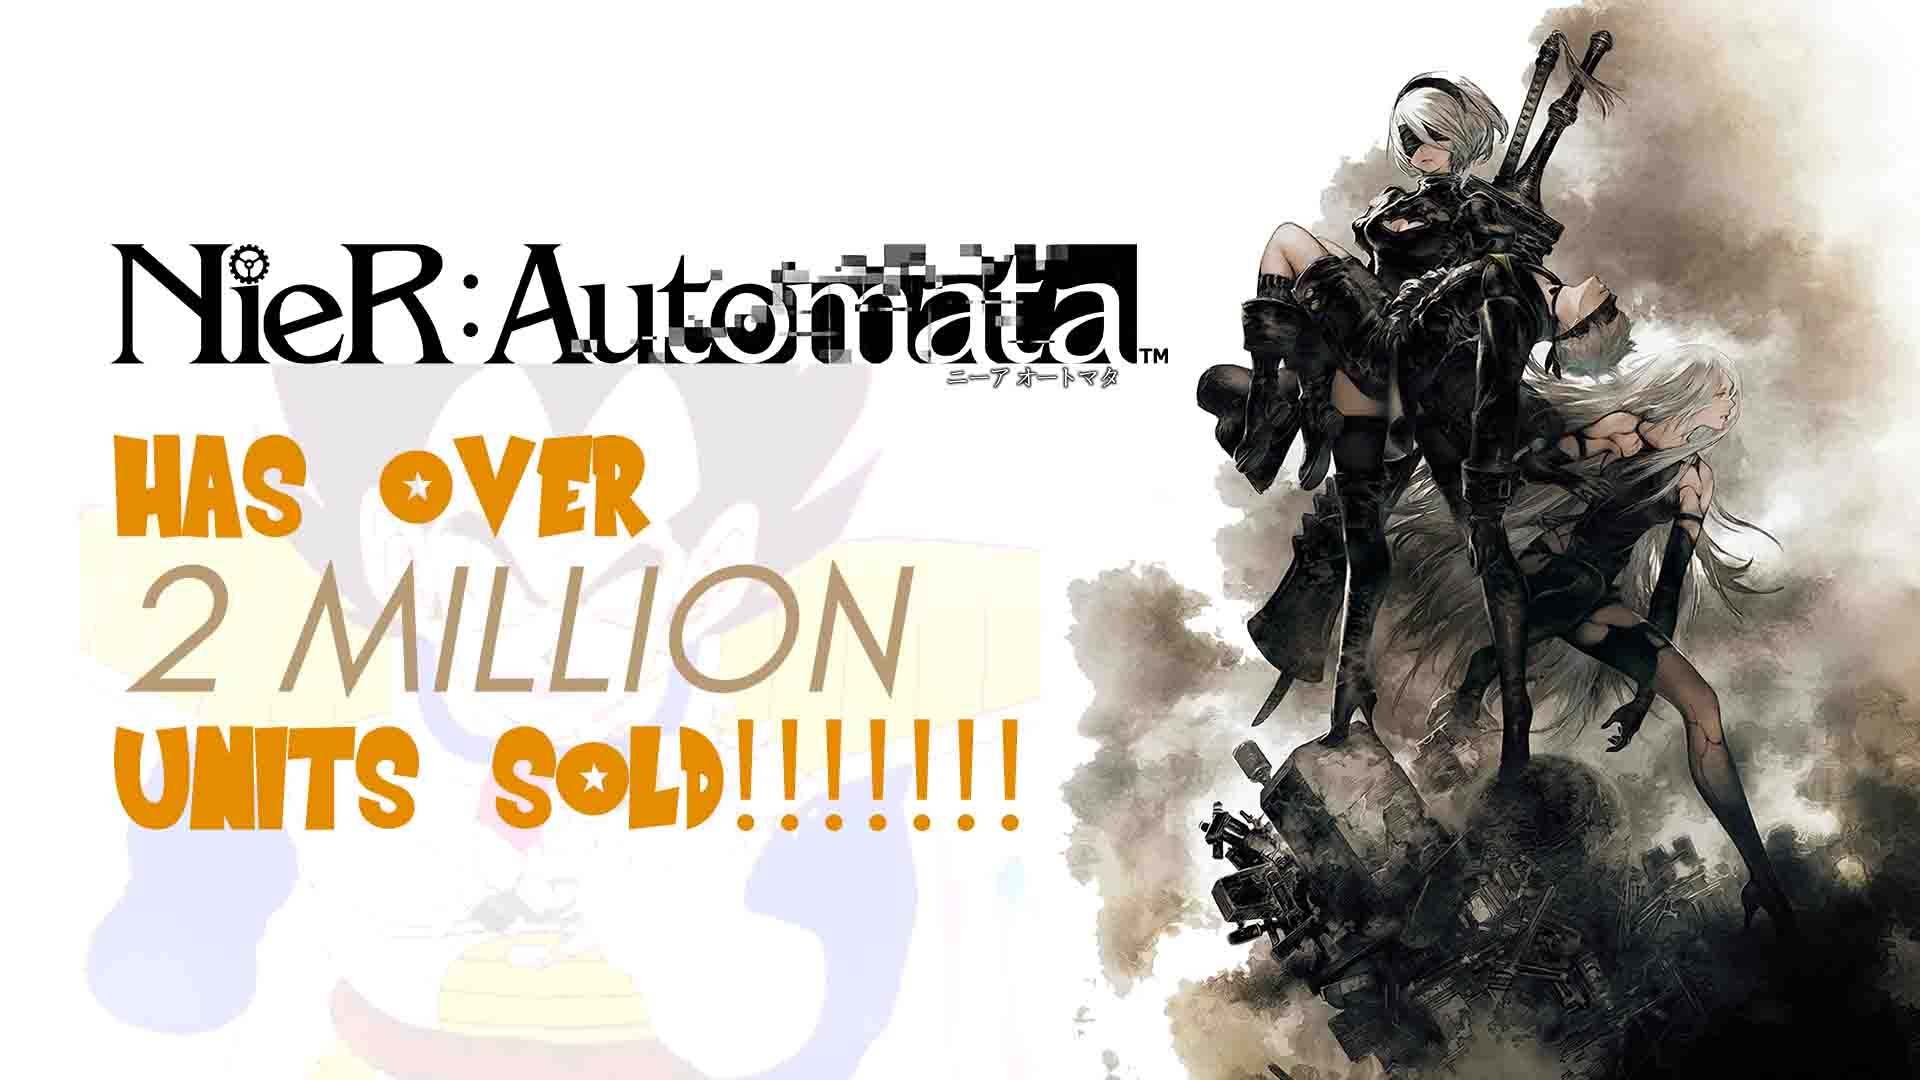 nier-automata-2-million-sales-platinum-games-square-enix-playstation-4-ps4-pc-steam-rpg-jrpg-arpg-action